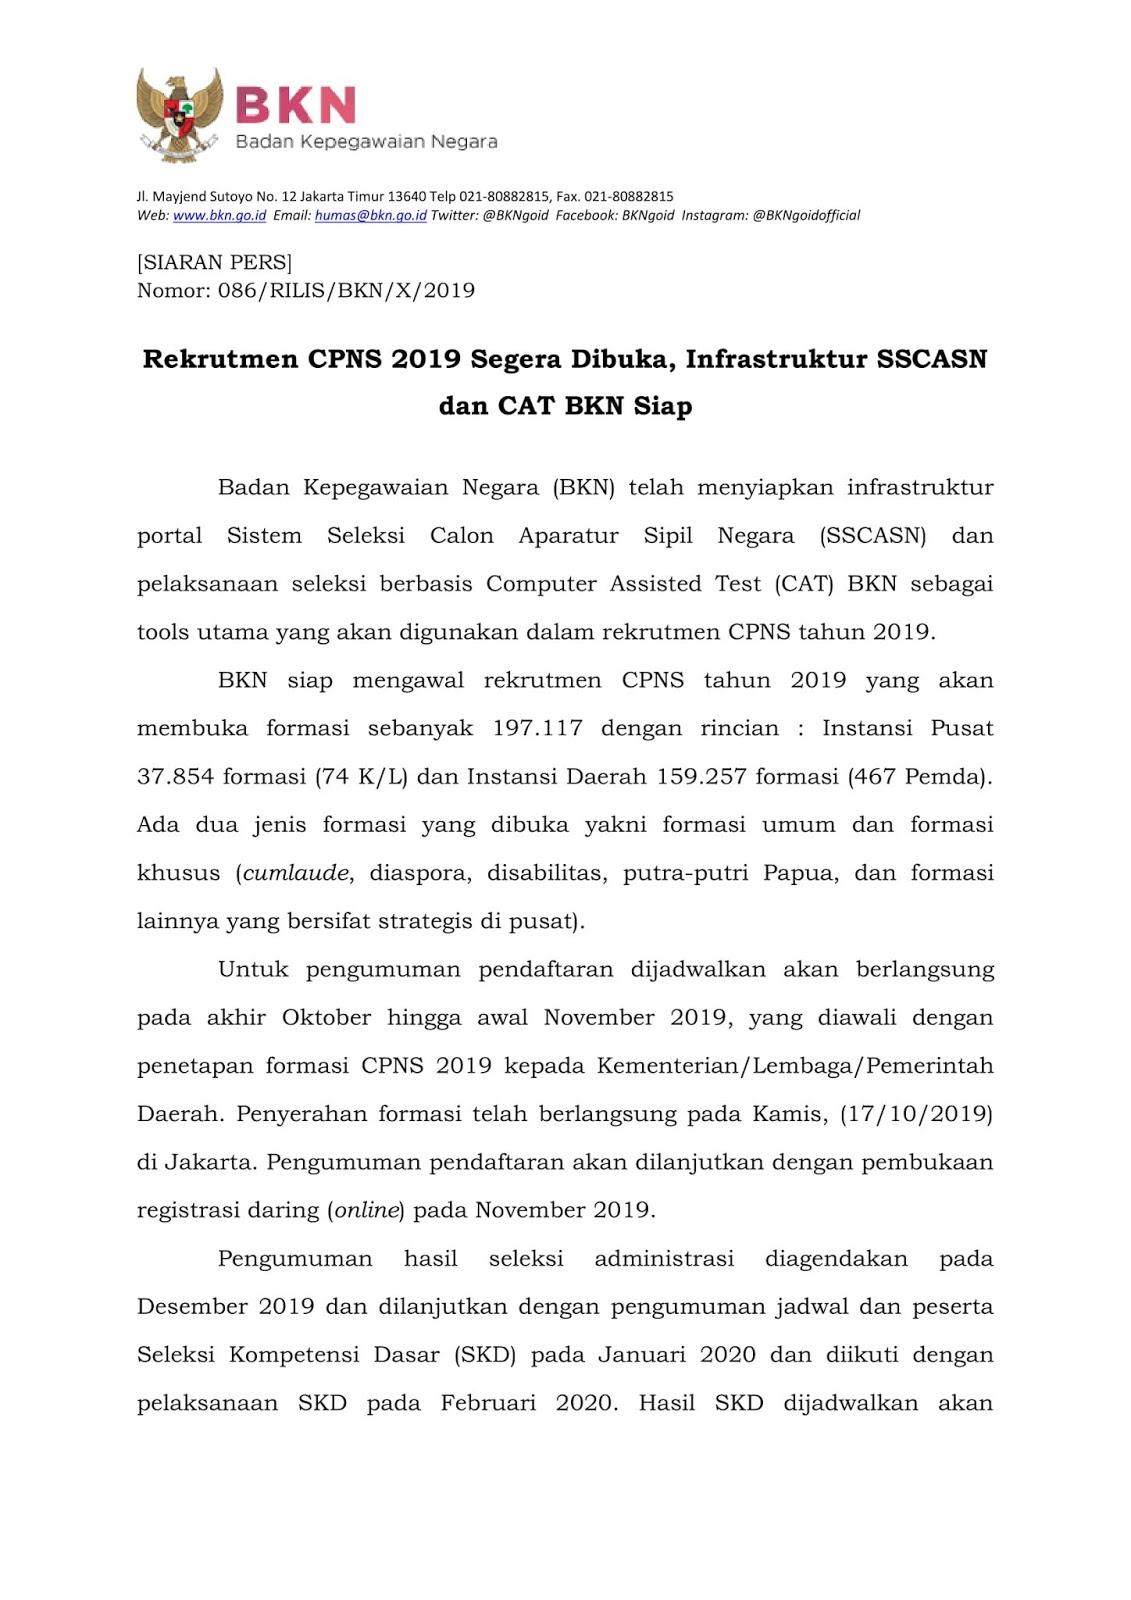 Rekrutmen CPNS Tahun  Segera Dibuka Lagi, Infrastruktur SSCASN dan CAT BKN Siap [Info Jadwal dan Alur CPNS ]